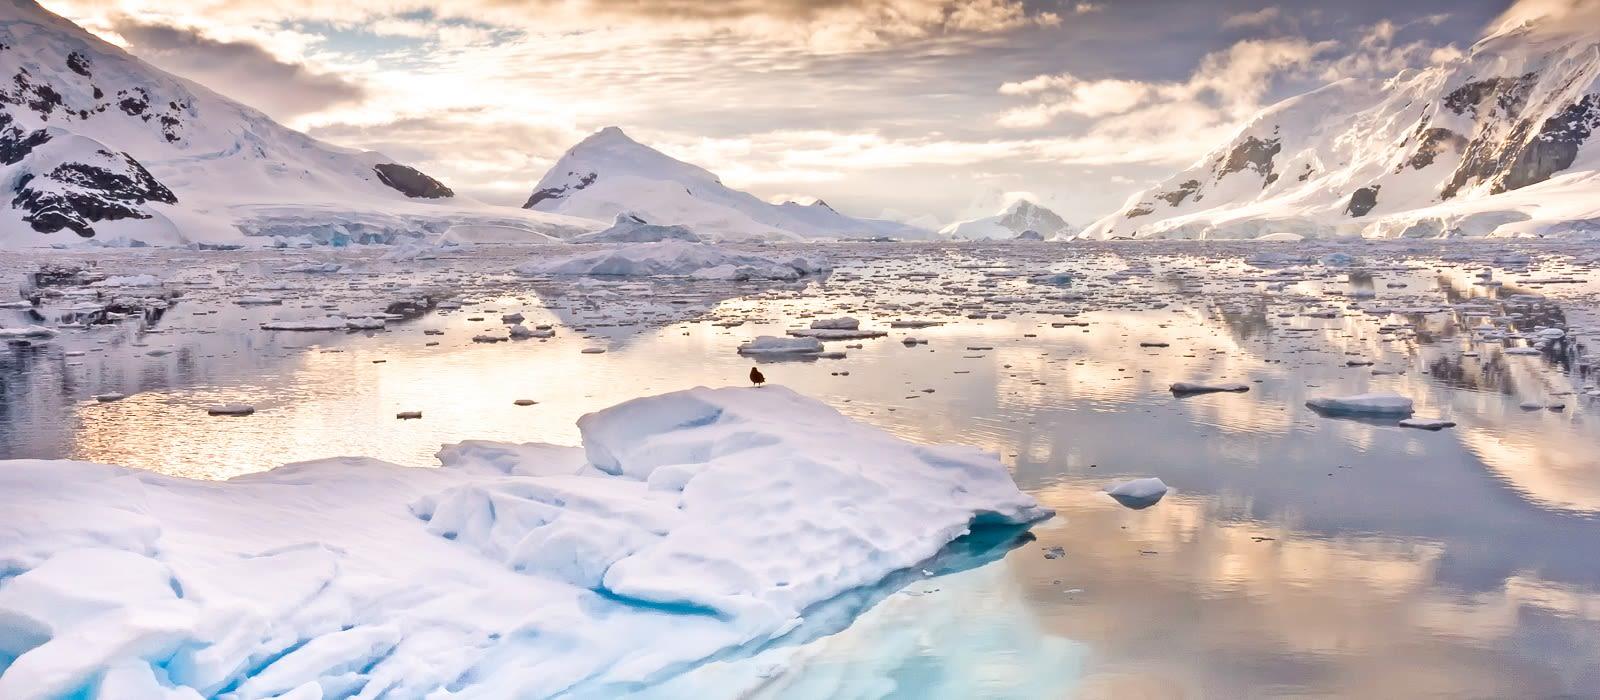 Reiseziel Antarktis Antarktis